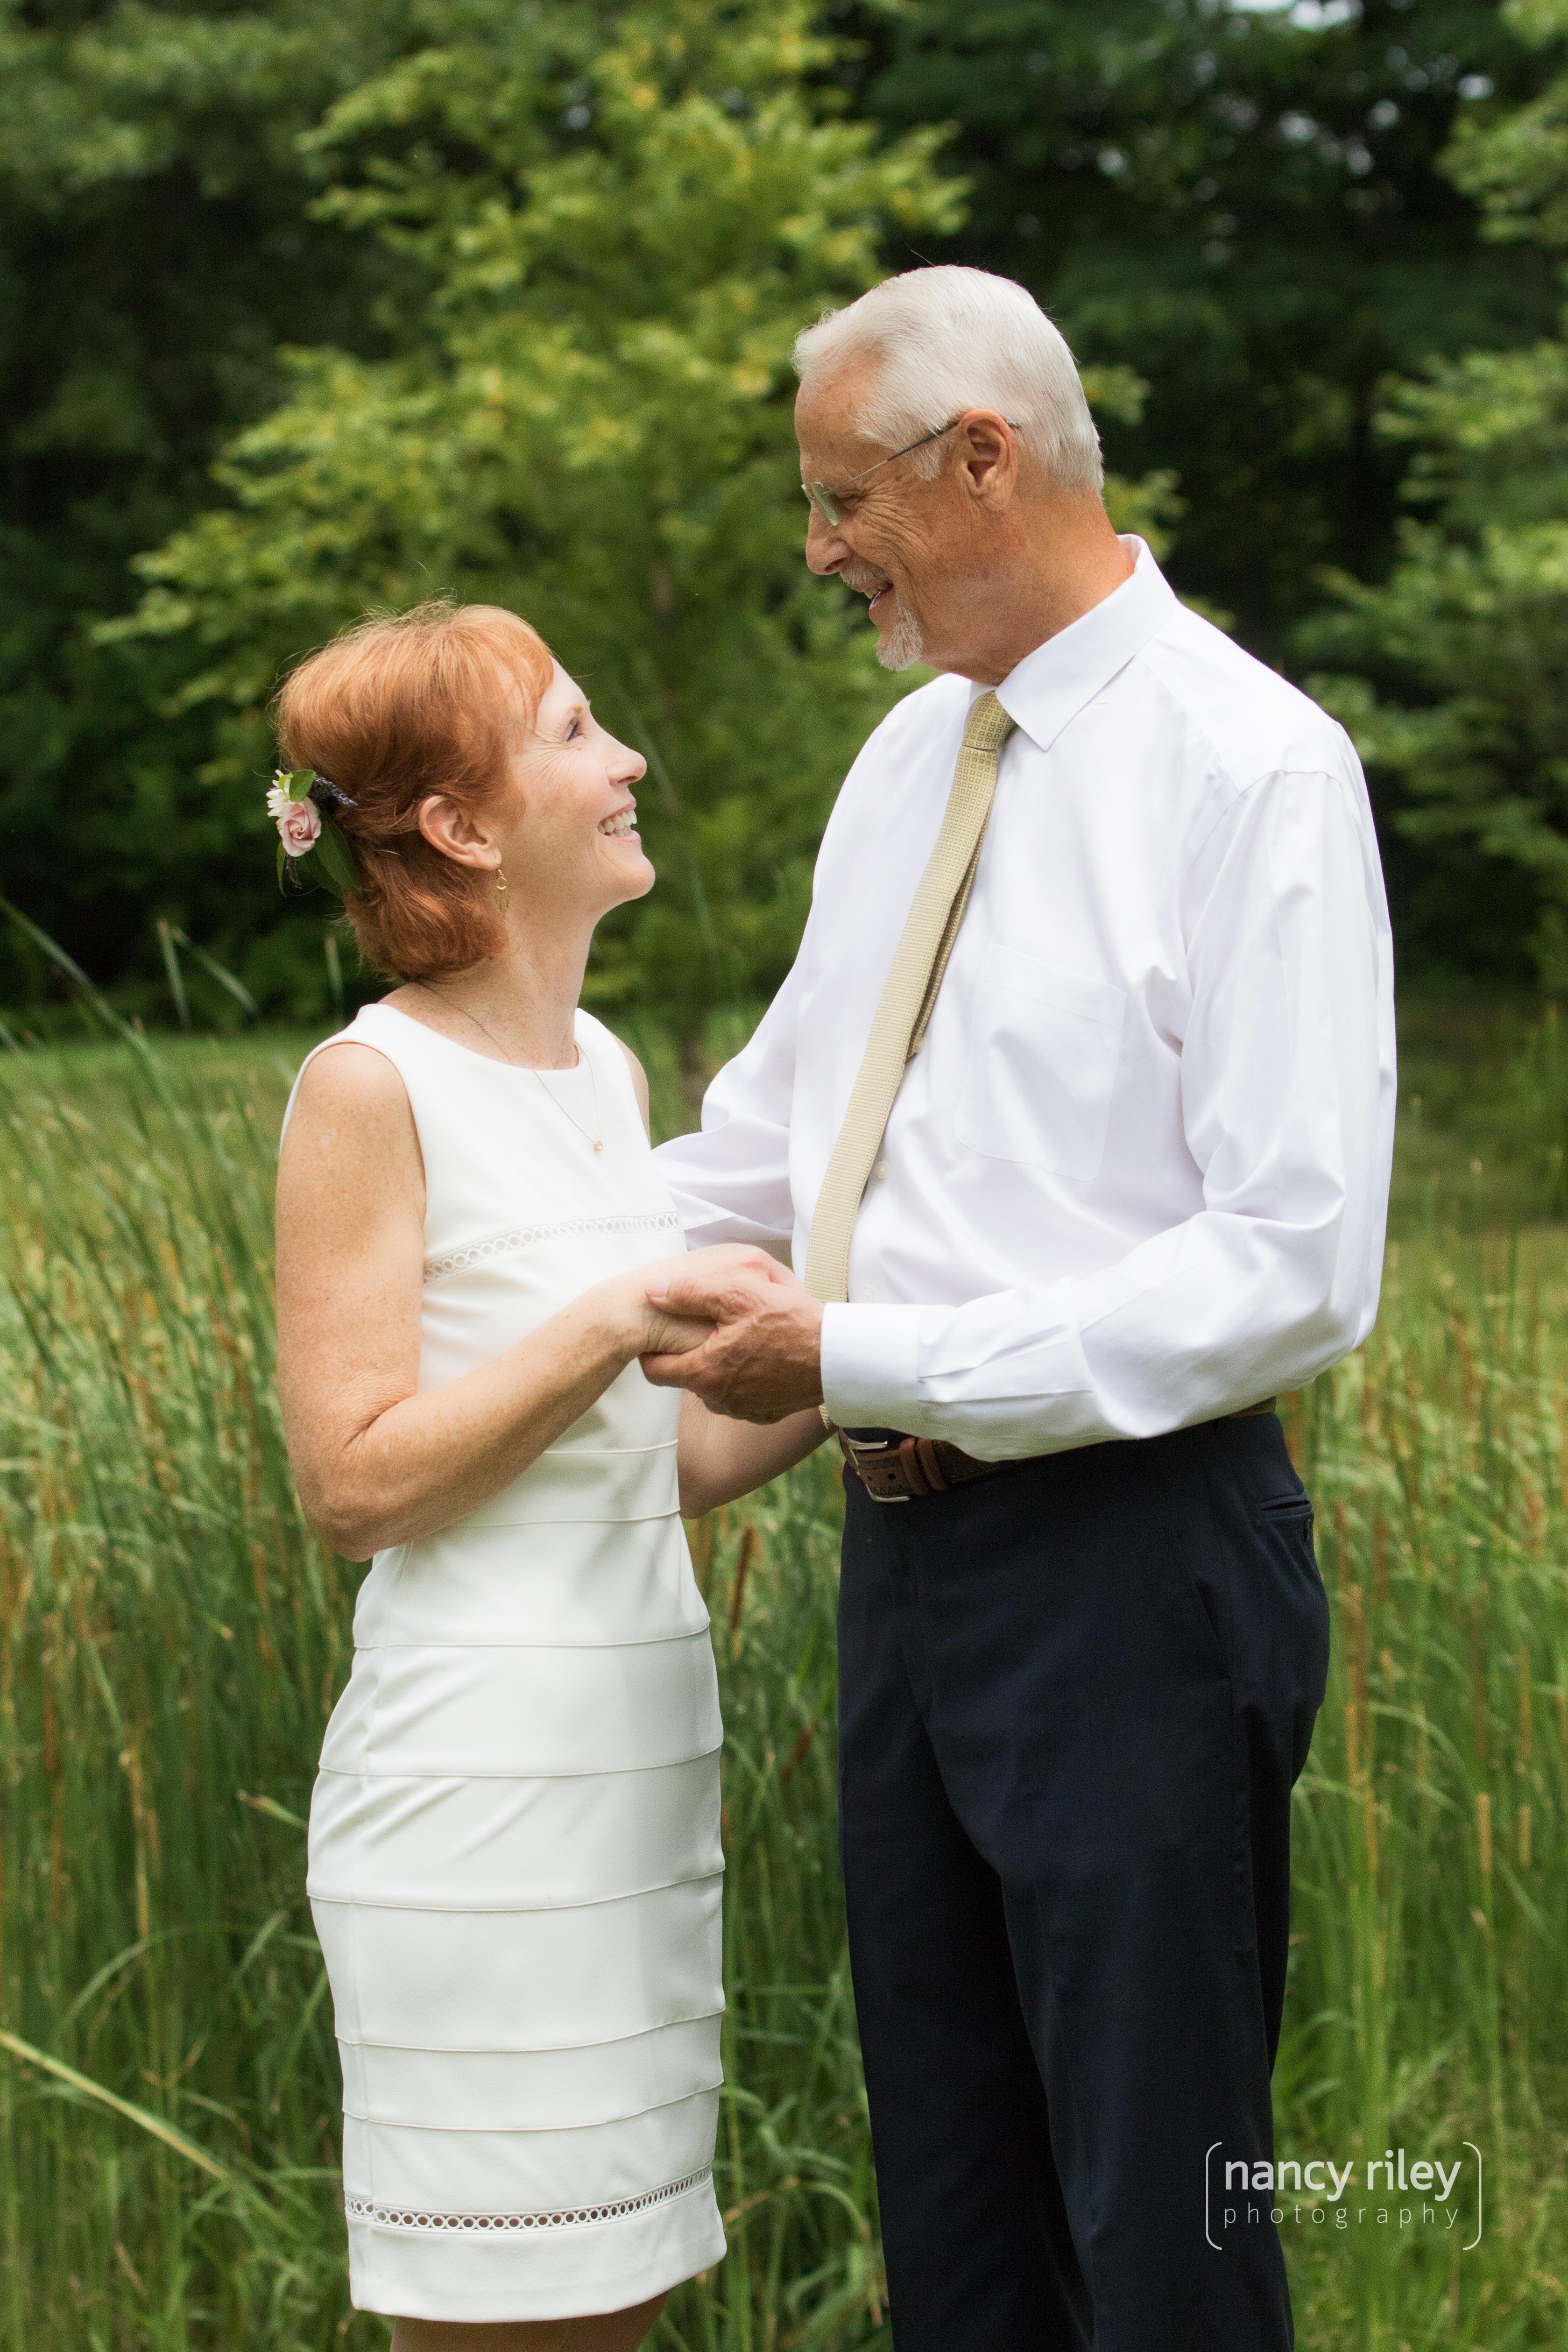 The wedding of Cynthia and Tom